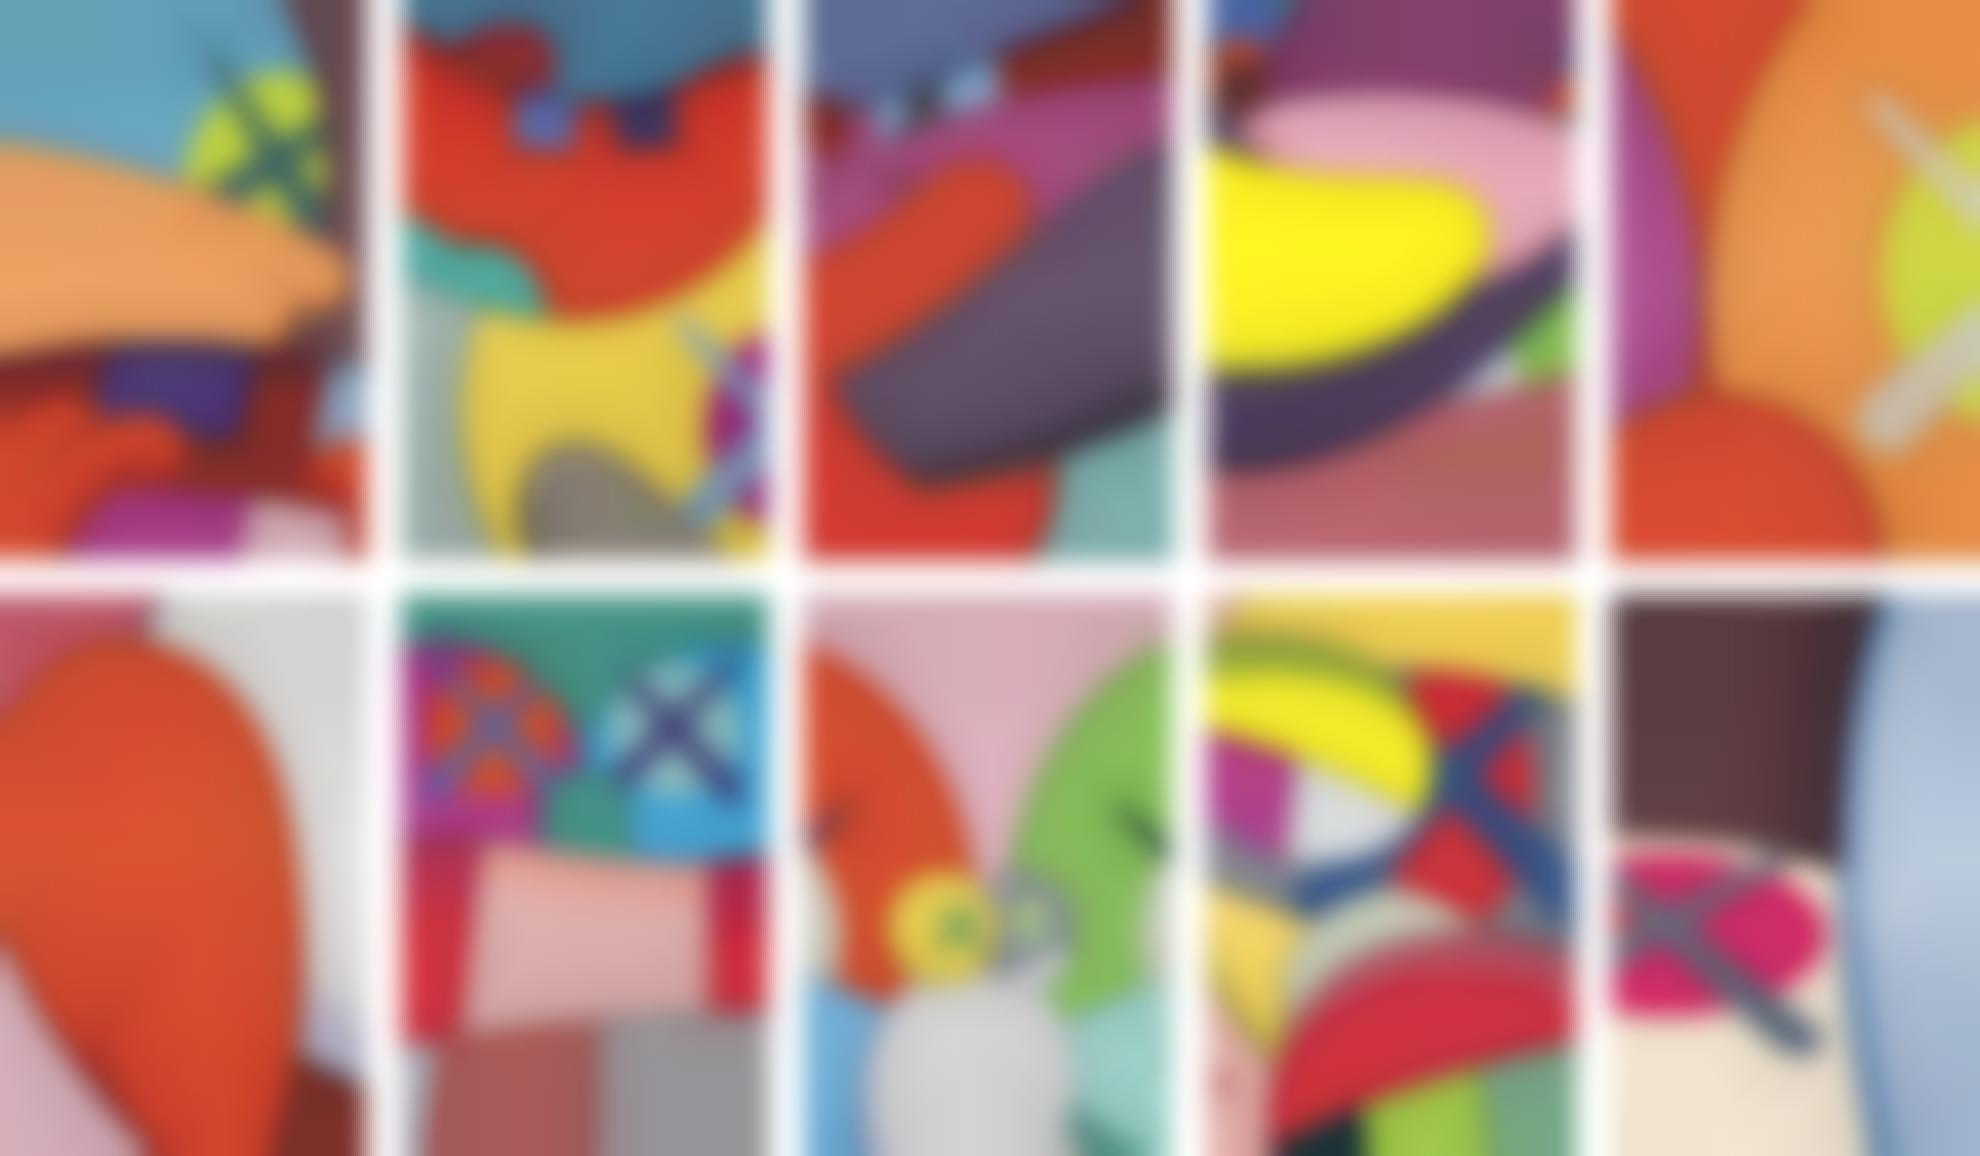 KAWS-No Reply (A Complete Set Of Ten Prints)-2015